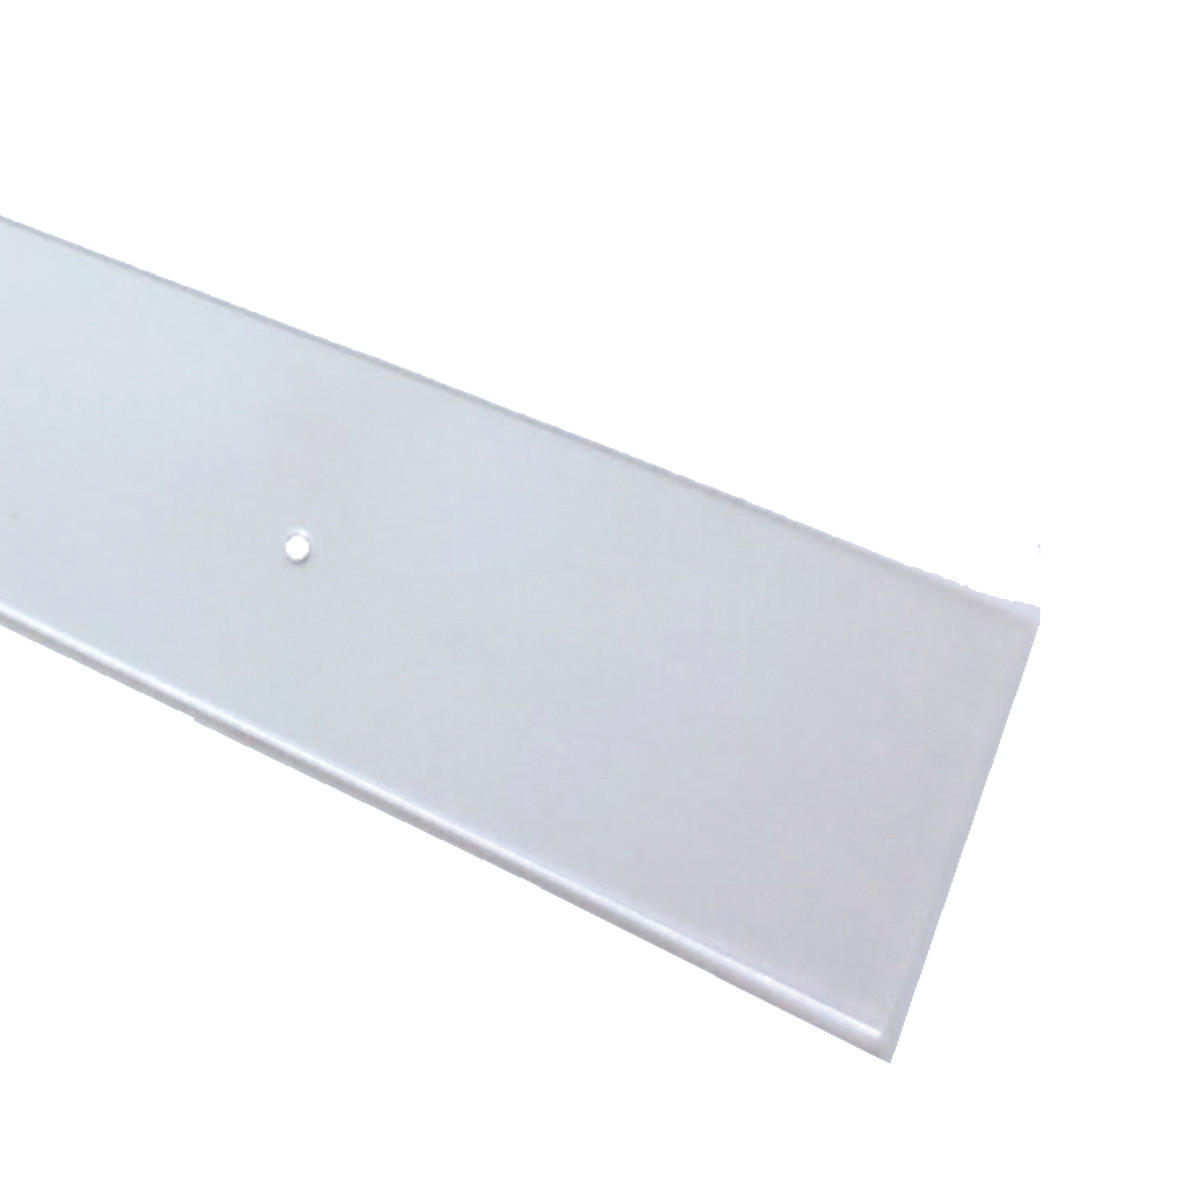 Paracolpi battisedia in polistirene trasparente 1 m x 100 mm, Sp 2 mm